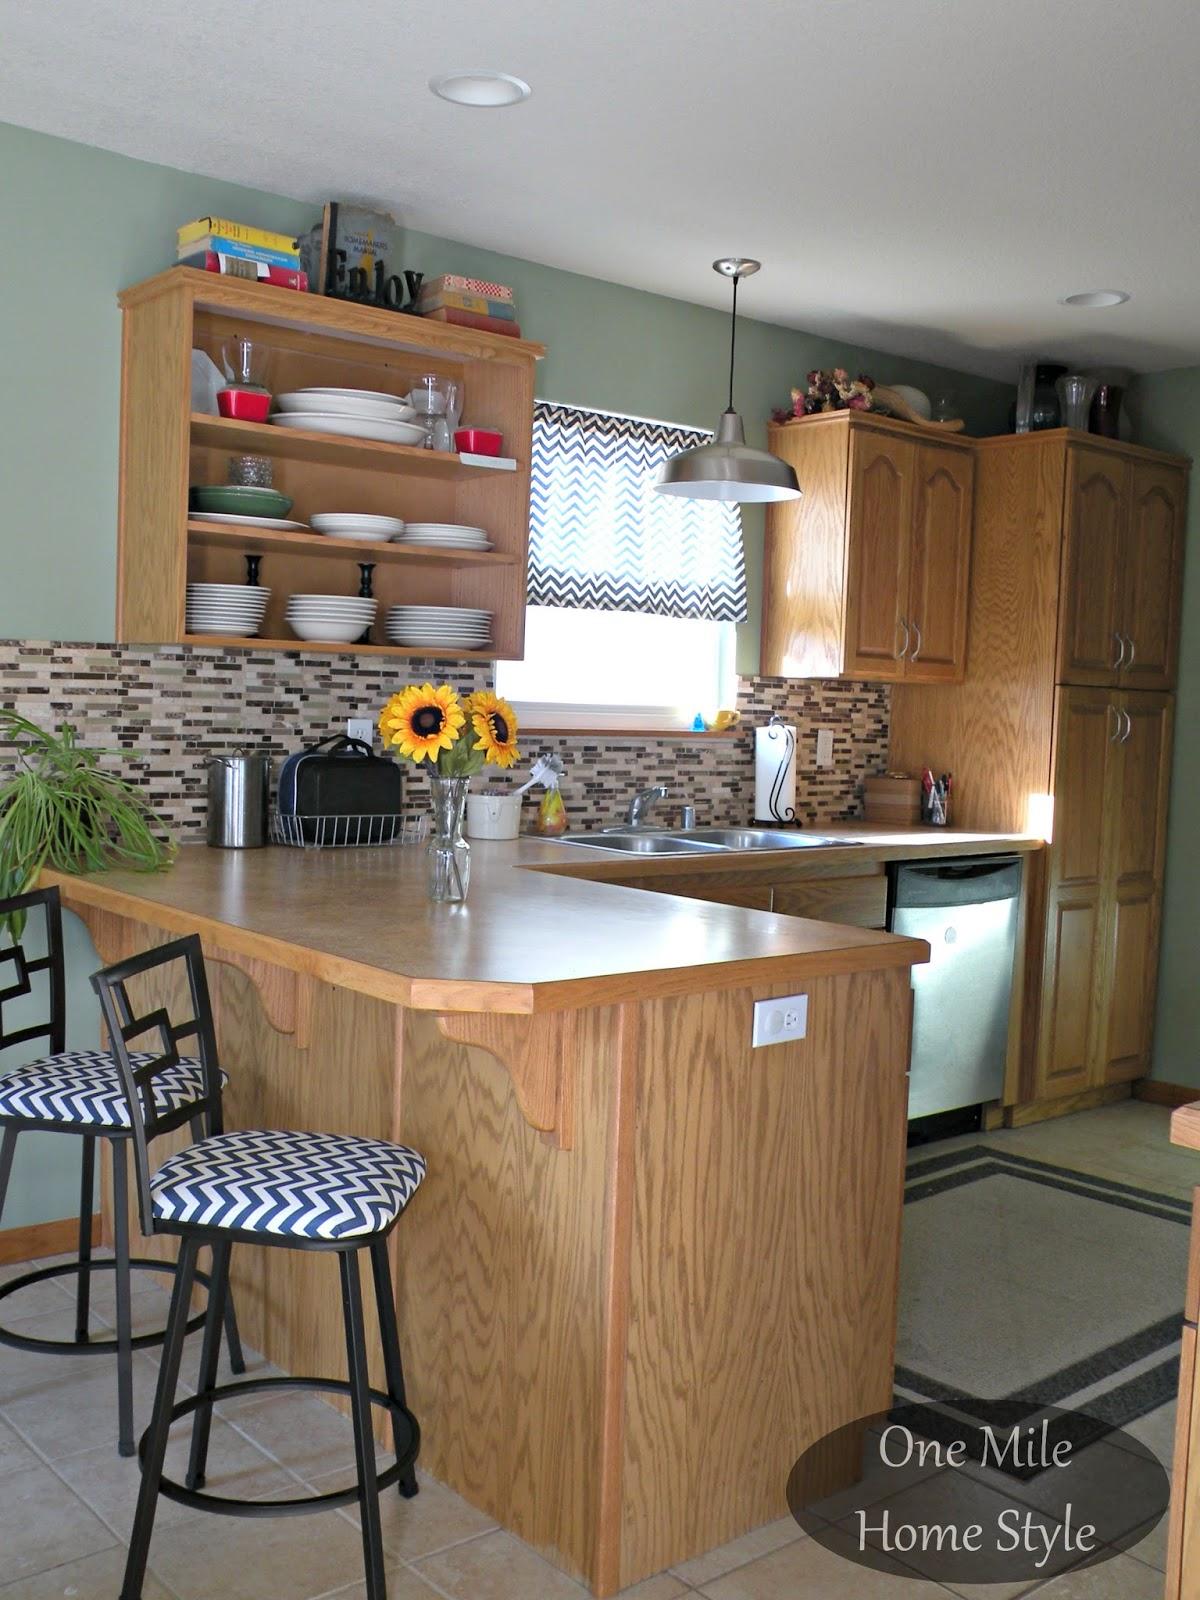 Kitchen Mini-Makeover - Tile backsplash and warehouse pendant, chevron barstools and curtain